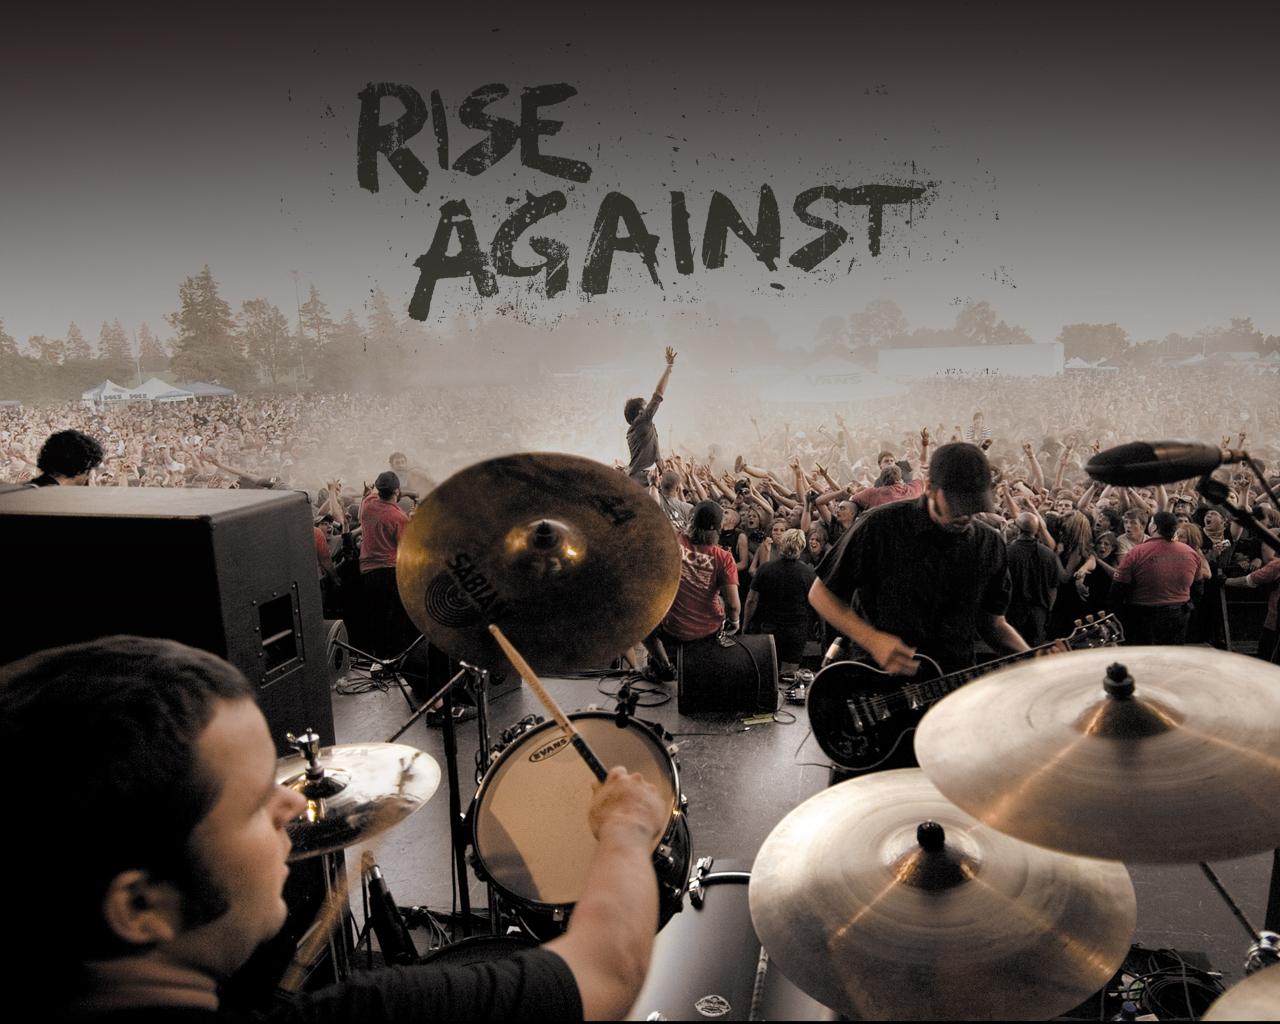 Rise-Against-rise-against-18111648-1280-1024.jpg